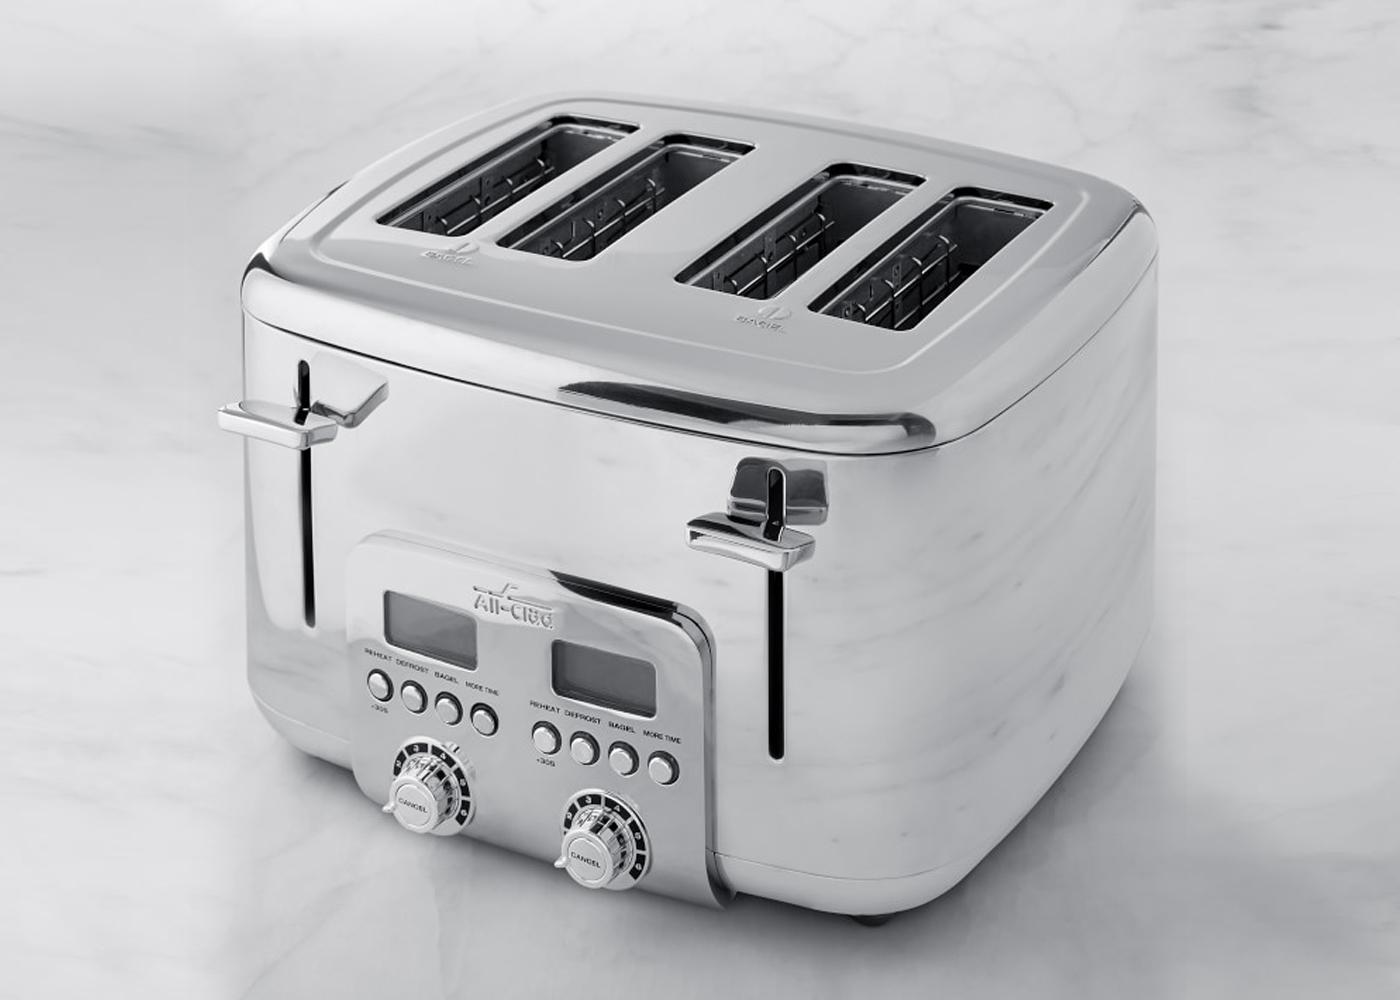 ALL-Clad_Electrics_Toaster_0005_Image_02.jpg